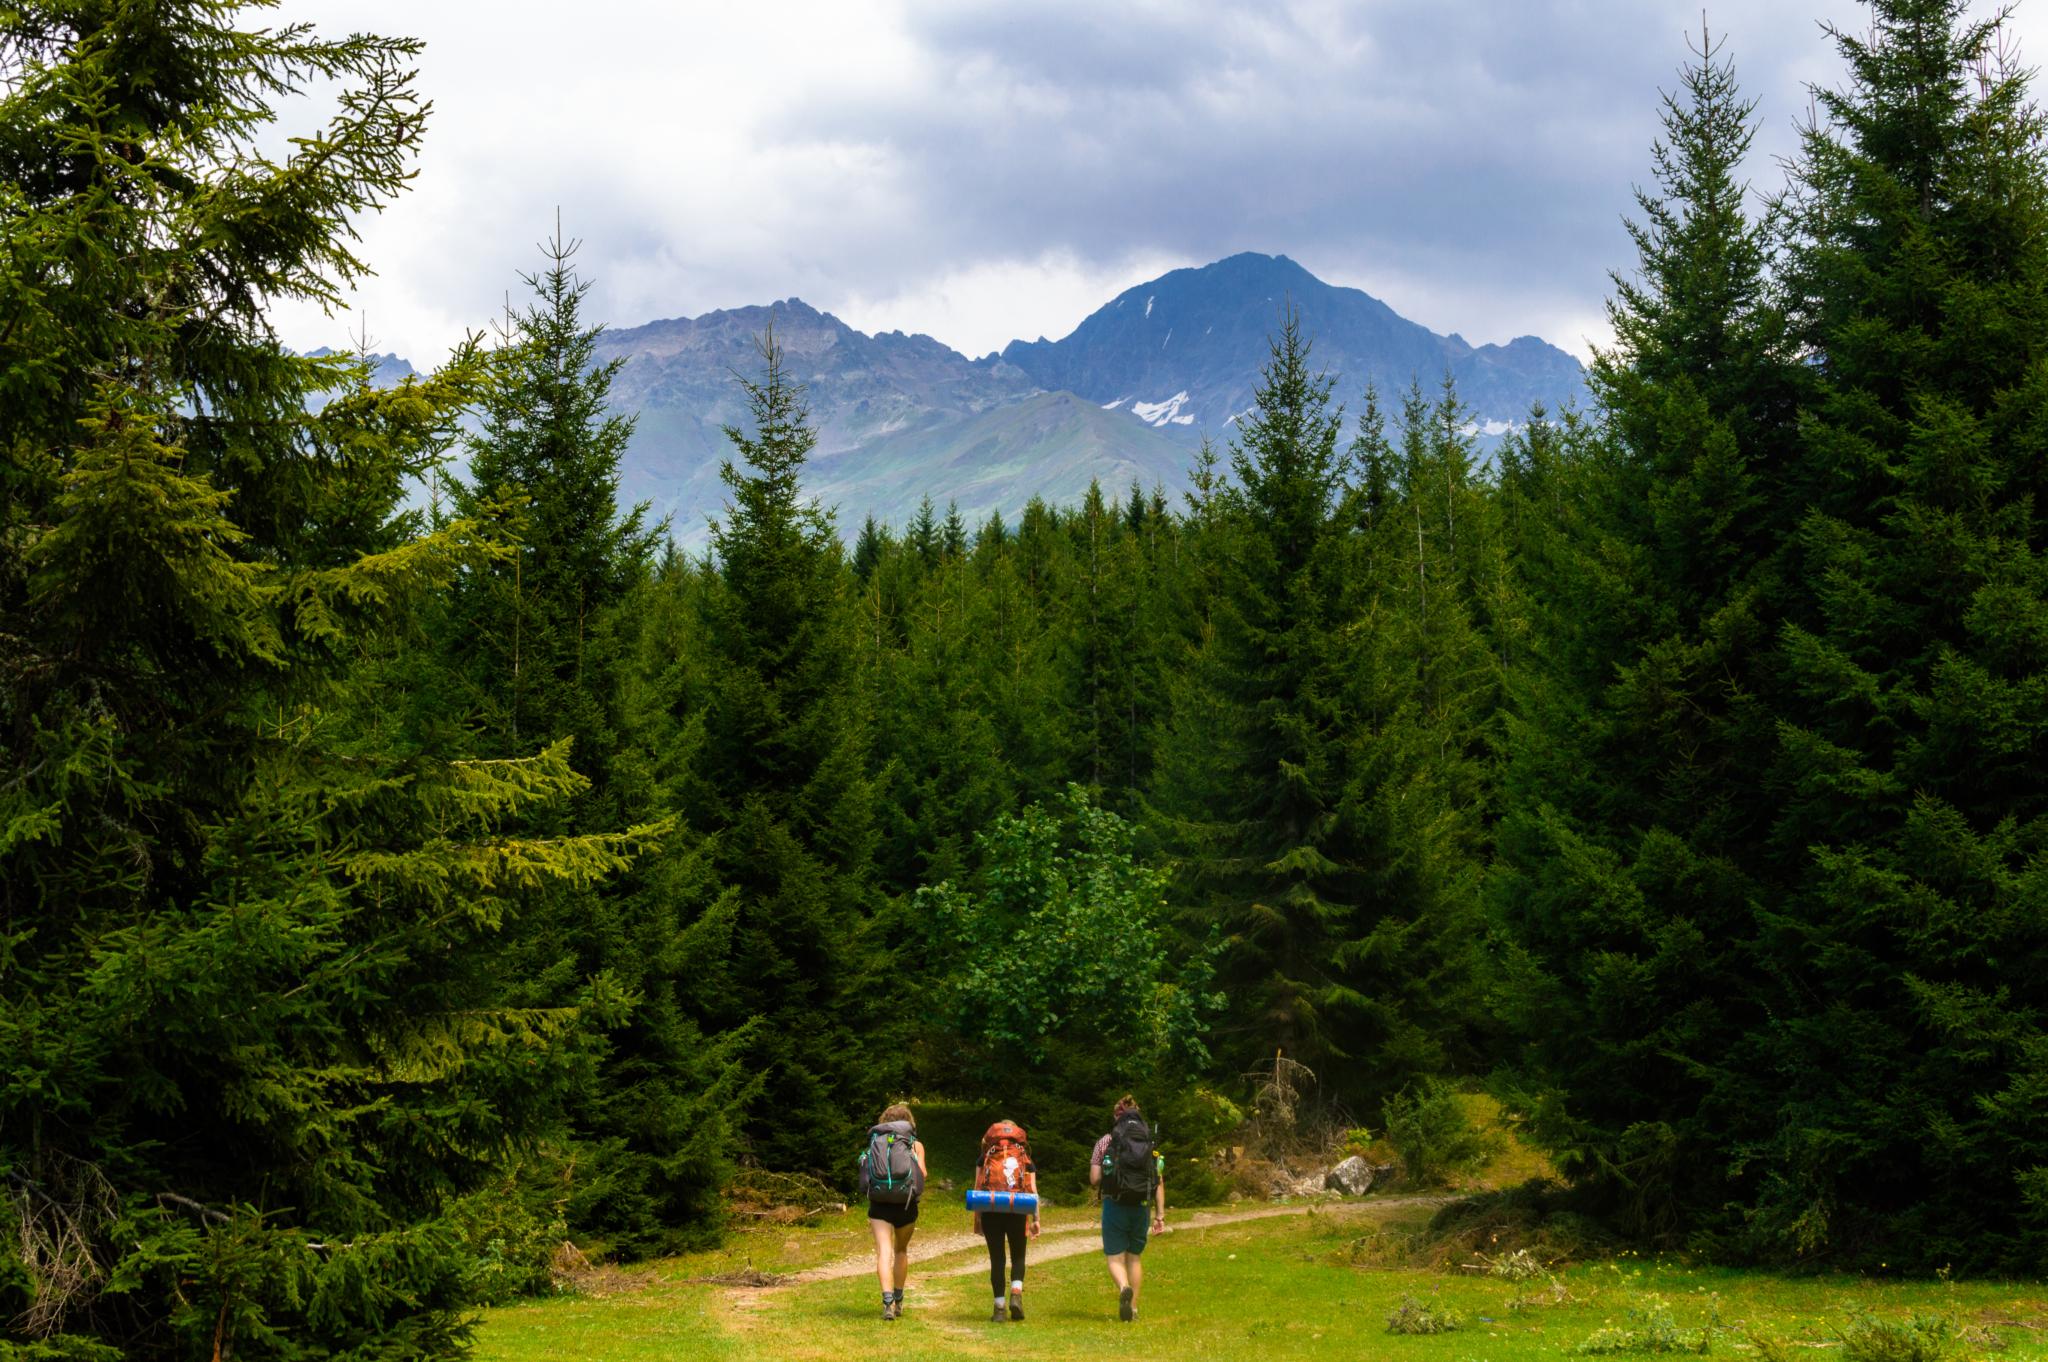 The Svaneti region in Georgia is the highest inhabited area in Europe. Photo: Patrick Salad, JAMnewsРегион Сванети в Грузии - самая высокая обитаемая зона в Европе.